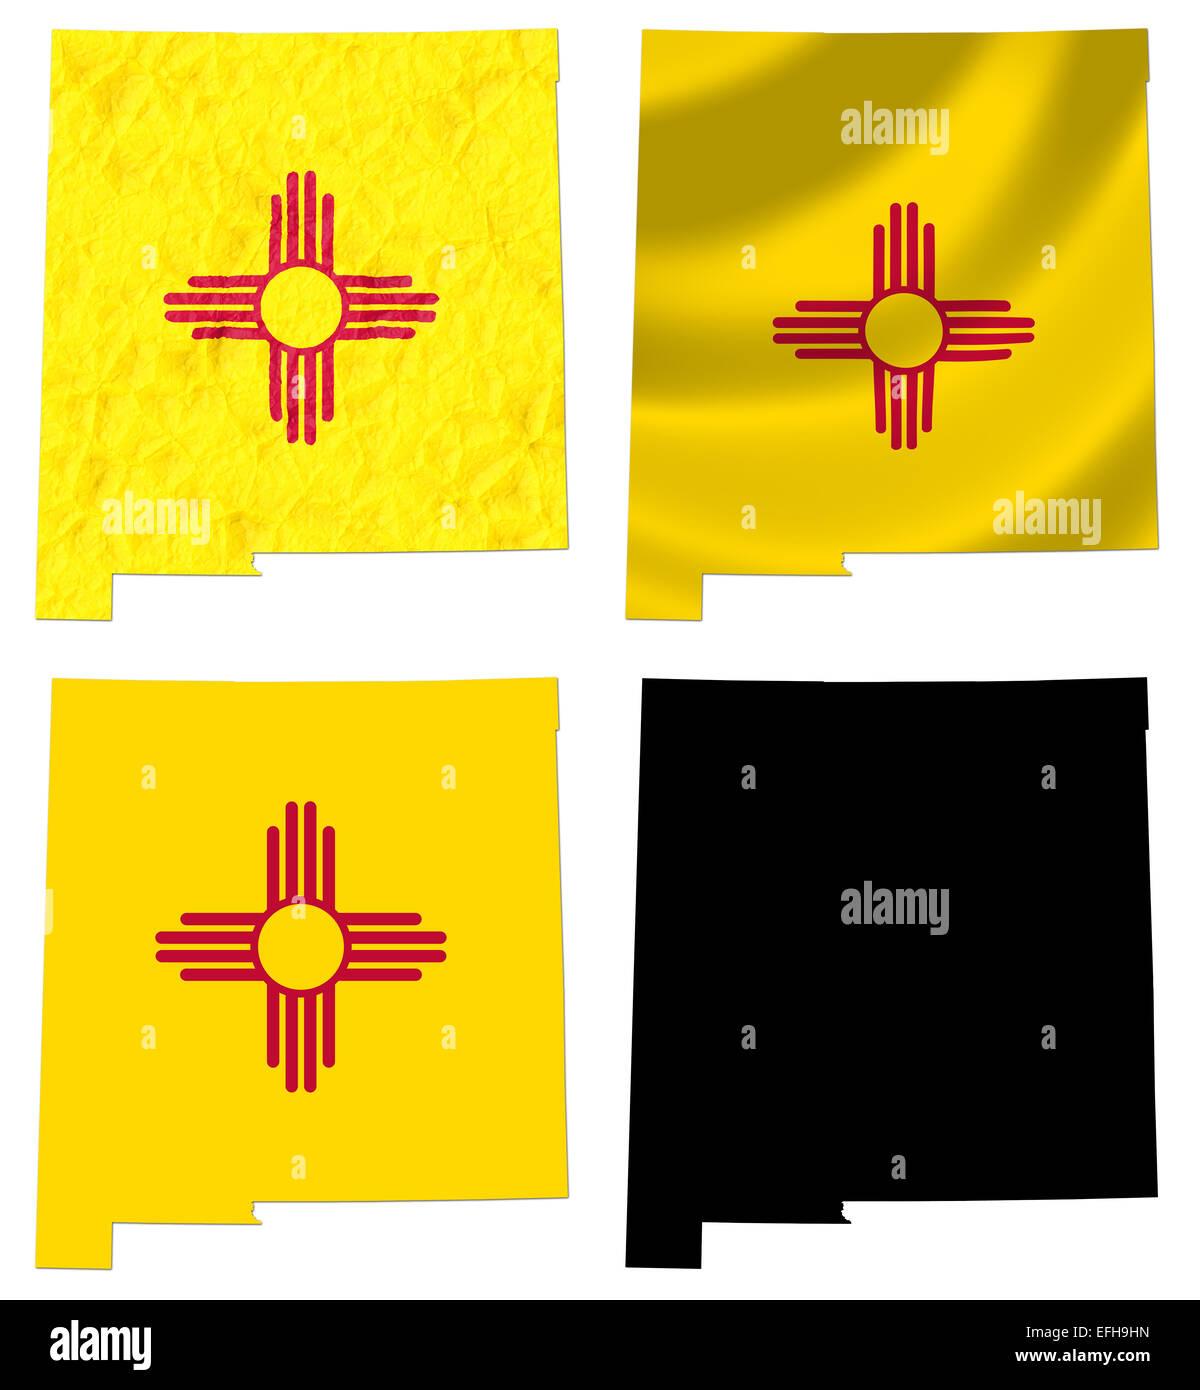 Us new mexico state flag over map stock photo royalty free image us new mexico state flag over map buycottarizona